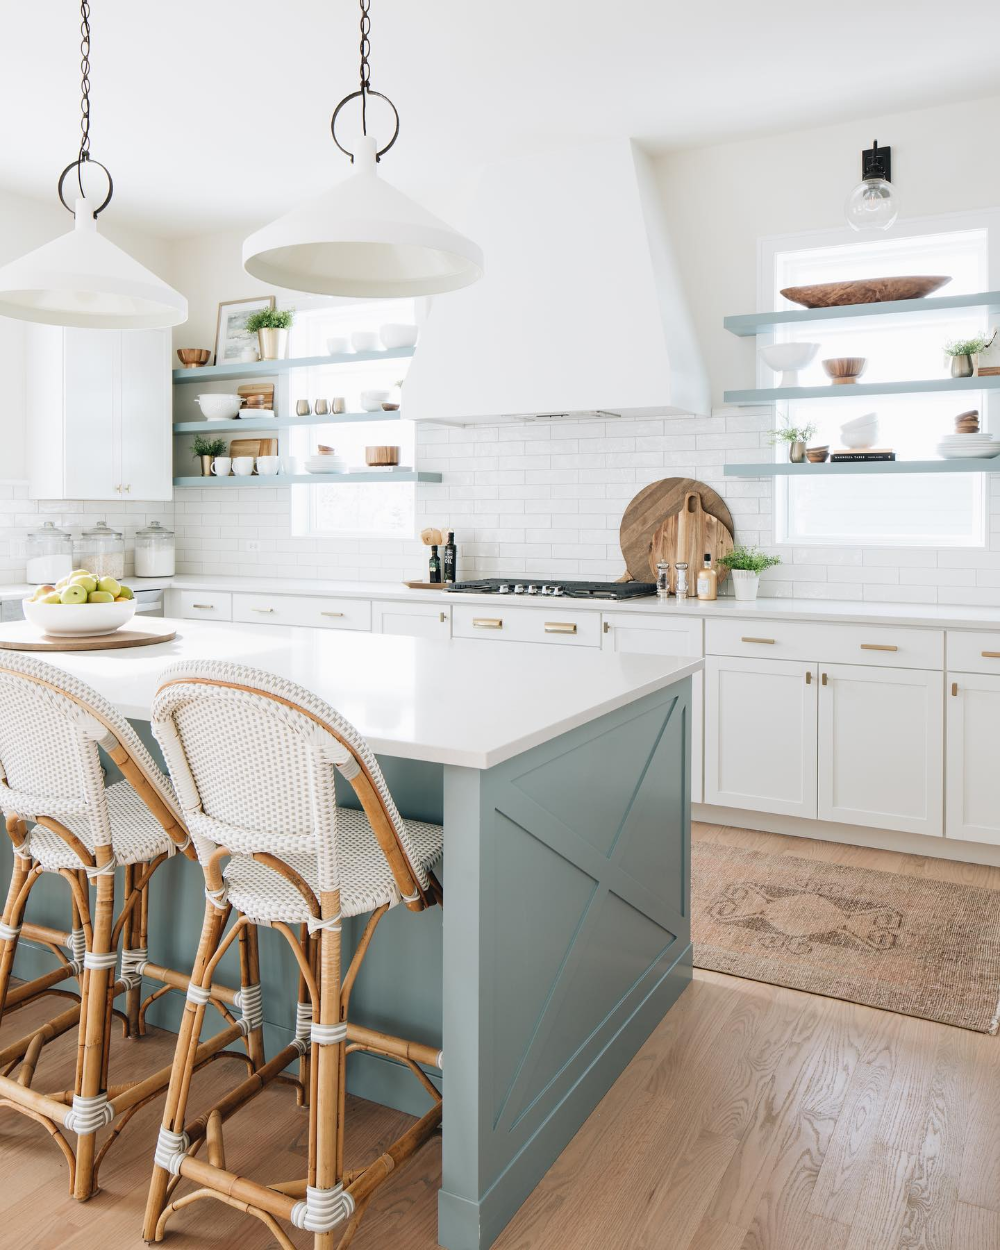 Riviera Counter Stool In 2020 Kitchen Renovation Kitchen Remodel Simple Kitchen